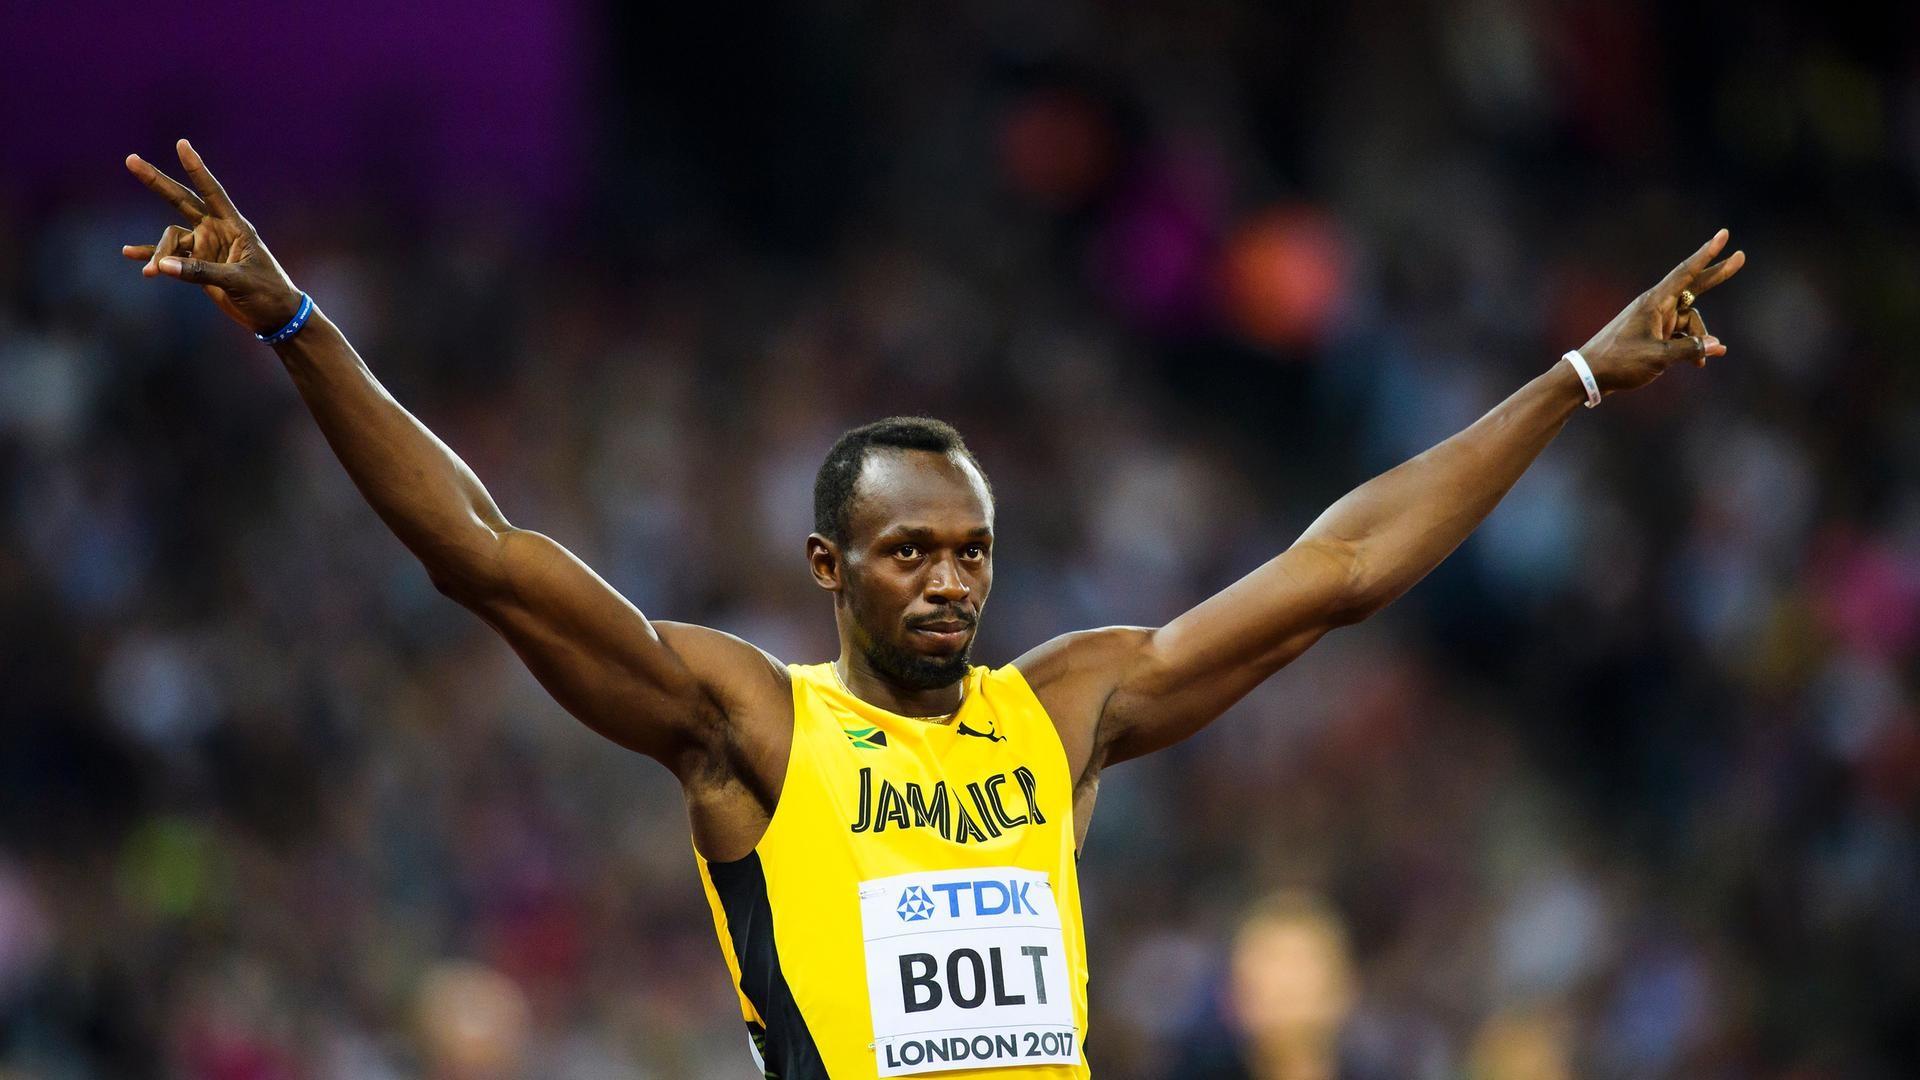 Usain Bolt Wallpaper 2018 Olympics 76 Images